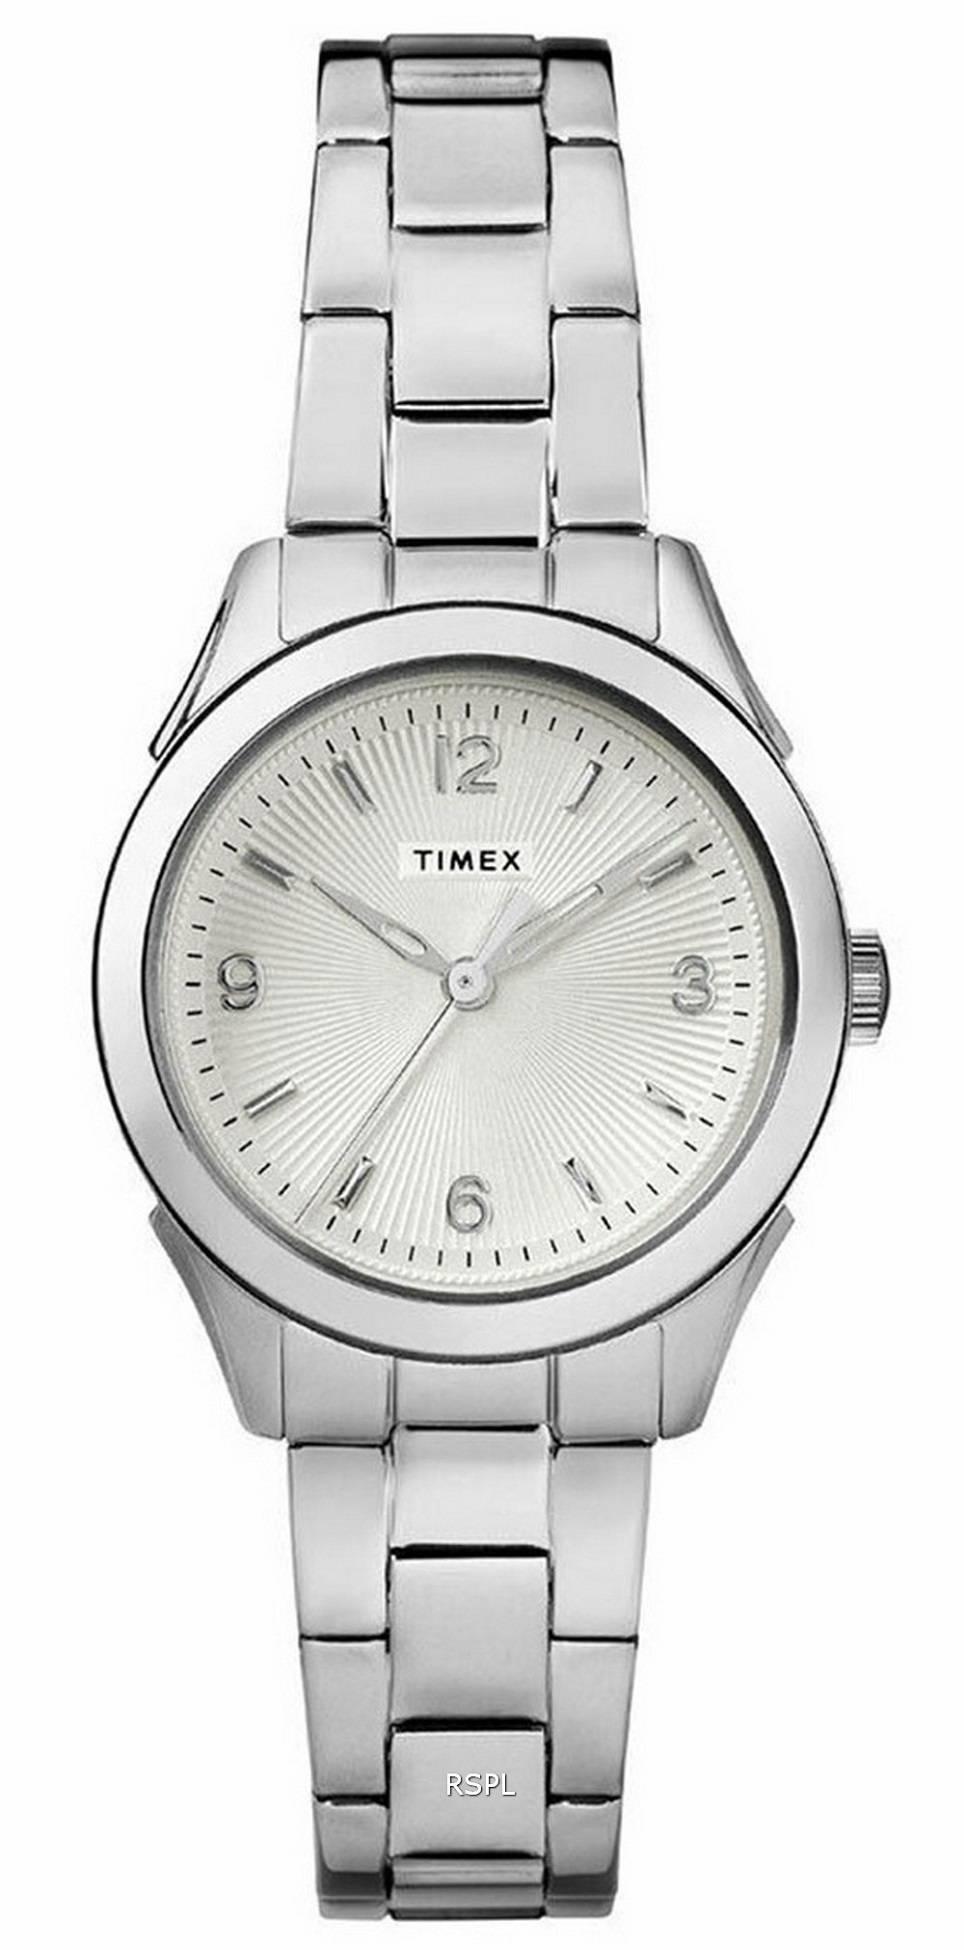 Timex Torrington Silver Dial Stainless Steel Quartz TW2R91500 Womens Watch